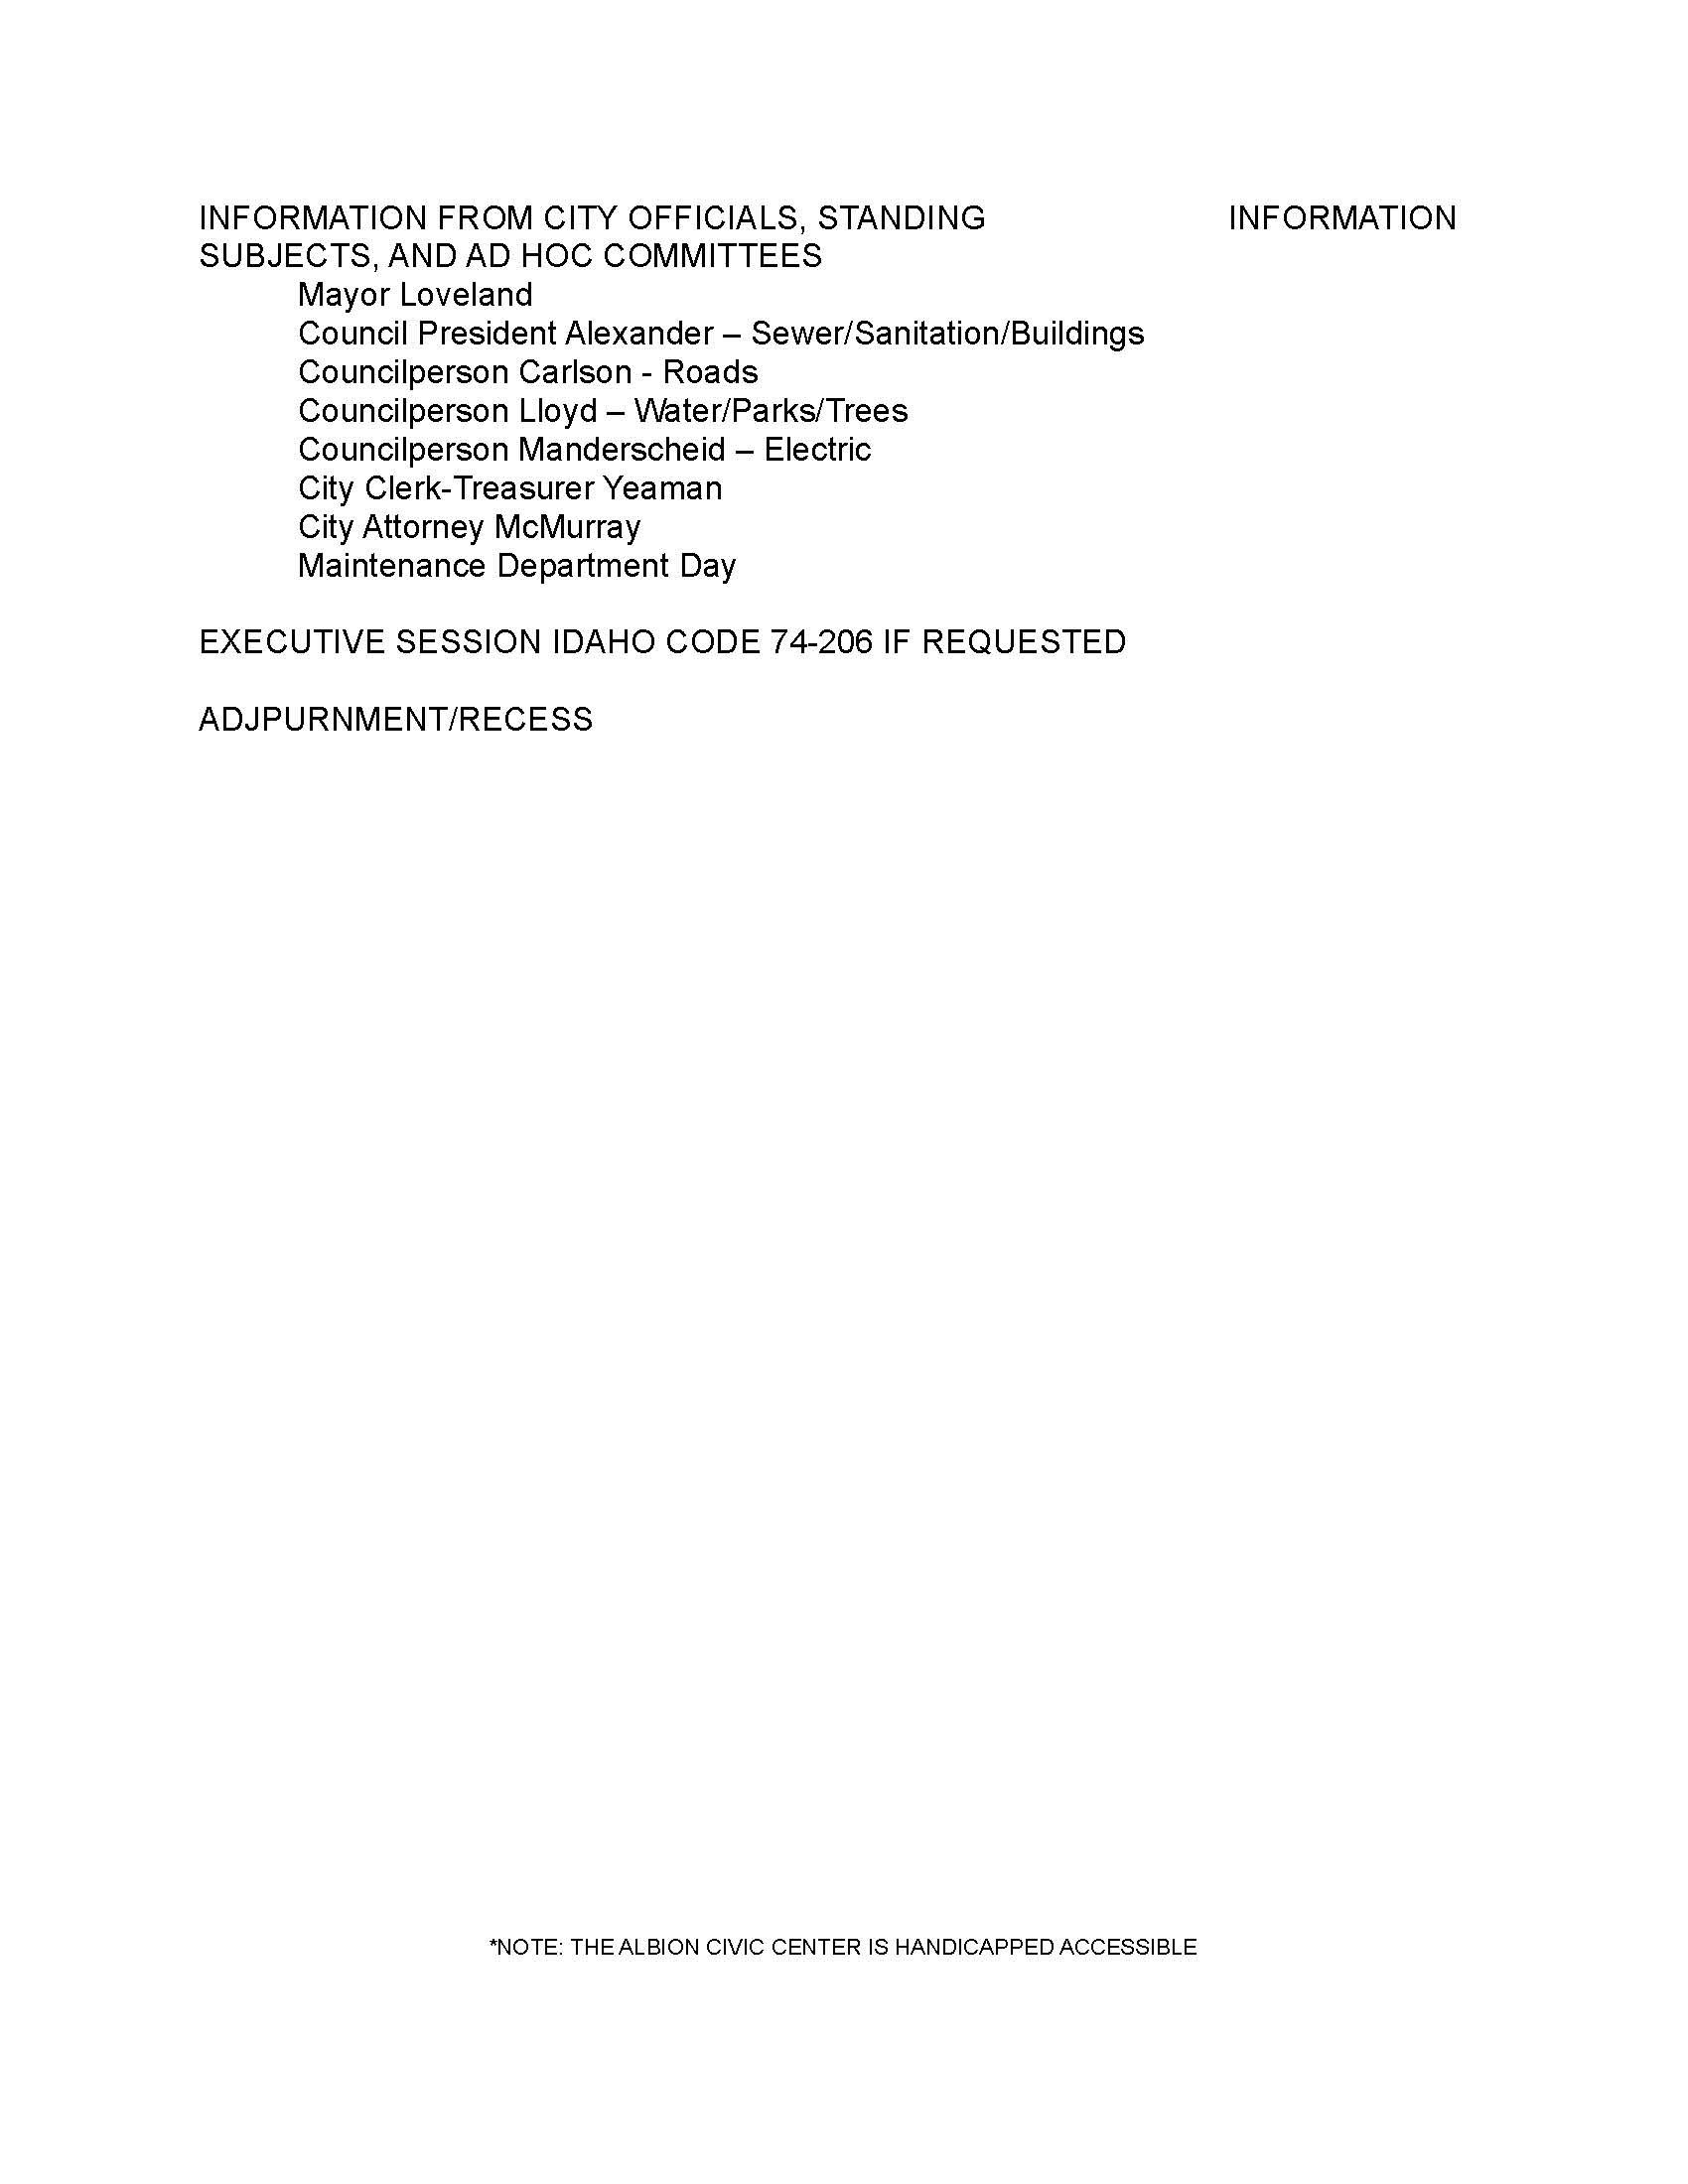 Agenda 07.02.19_Page_2.jpg